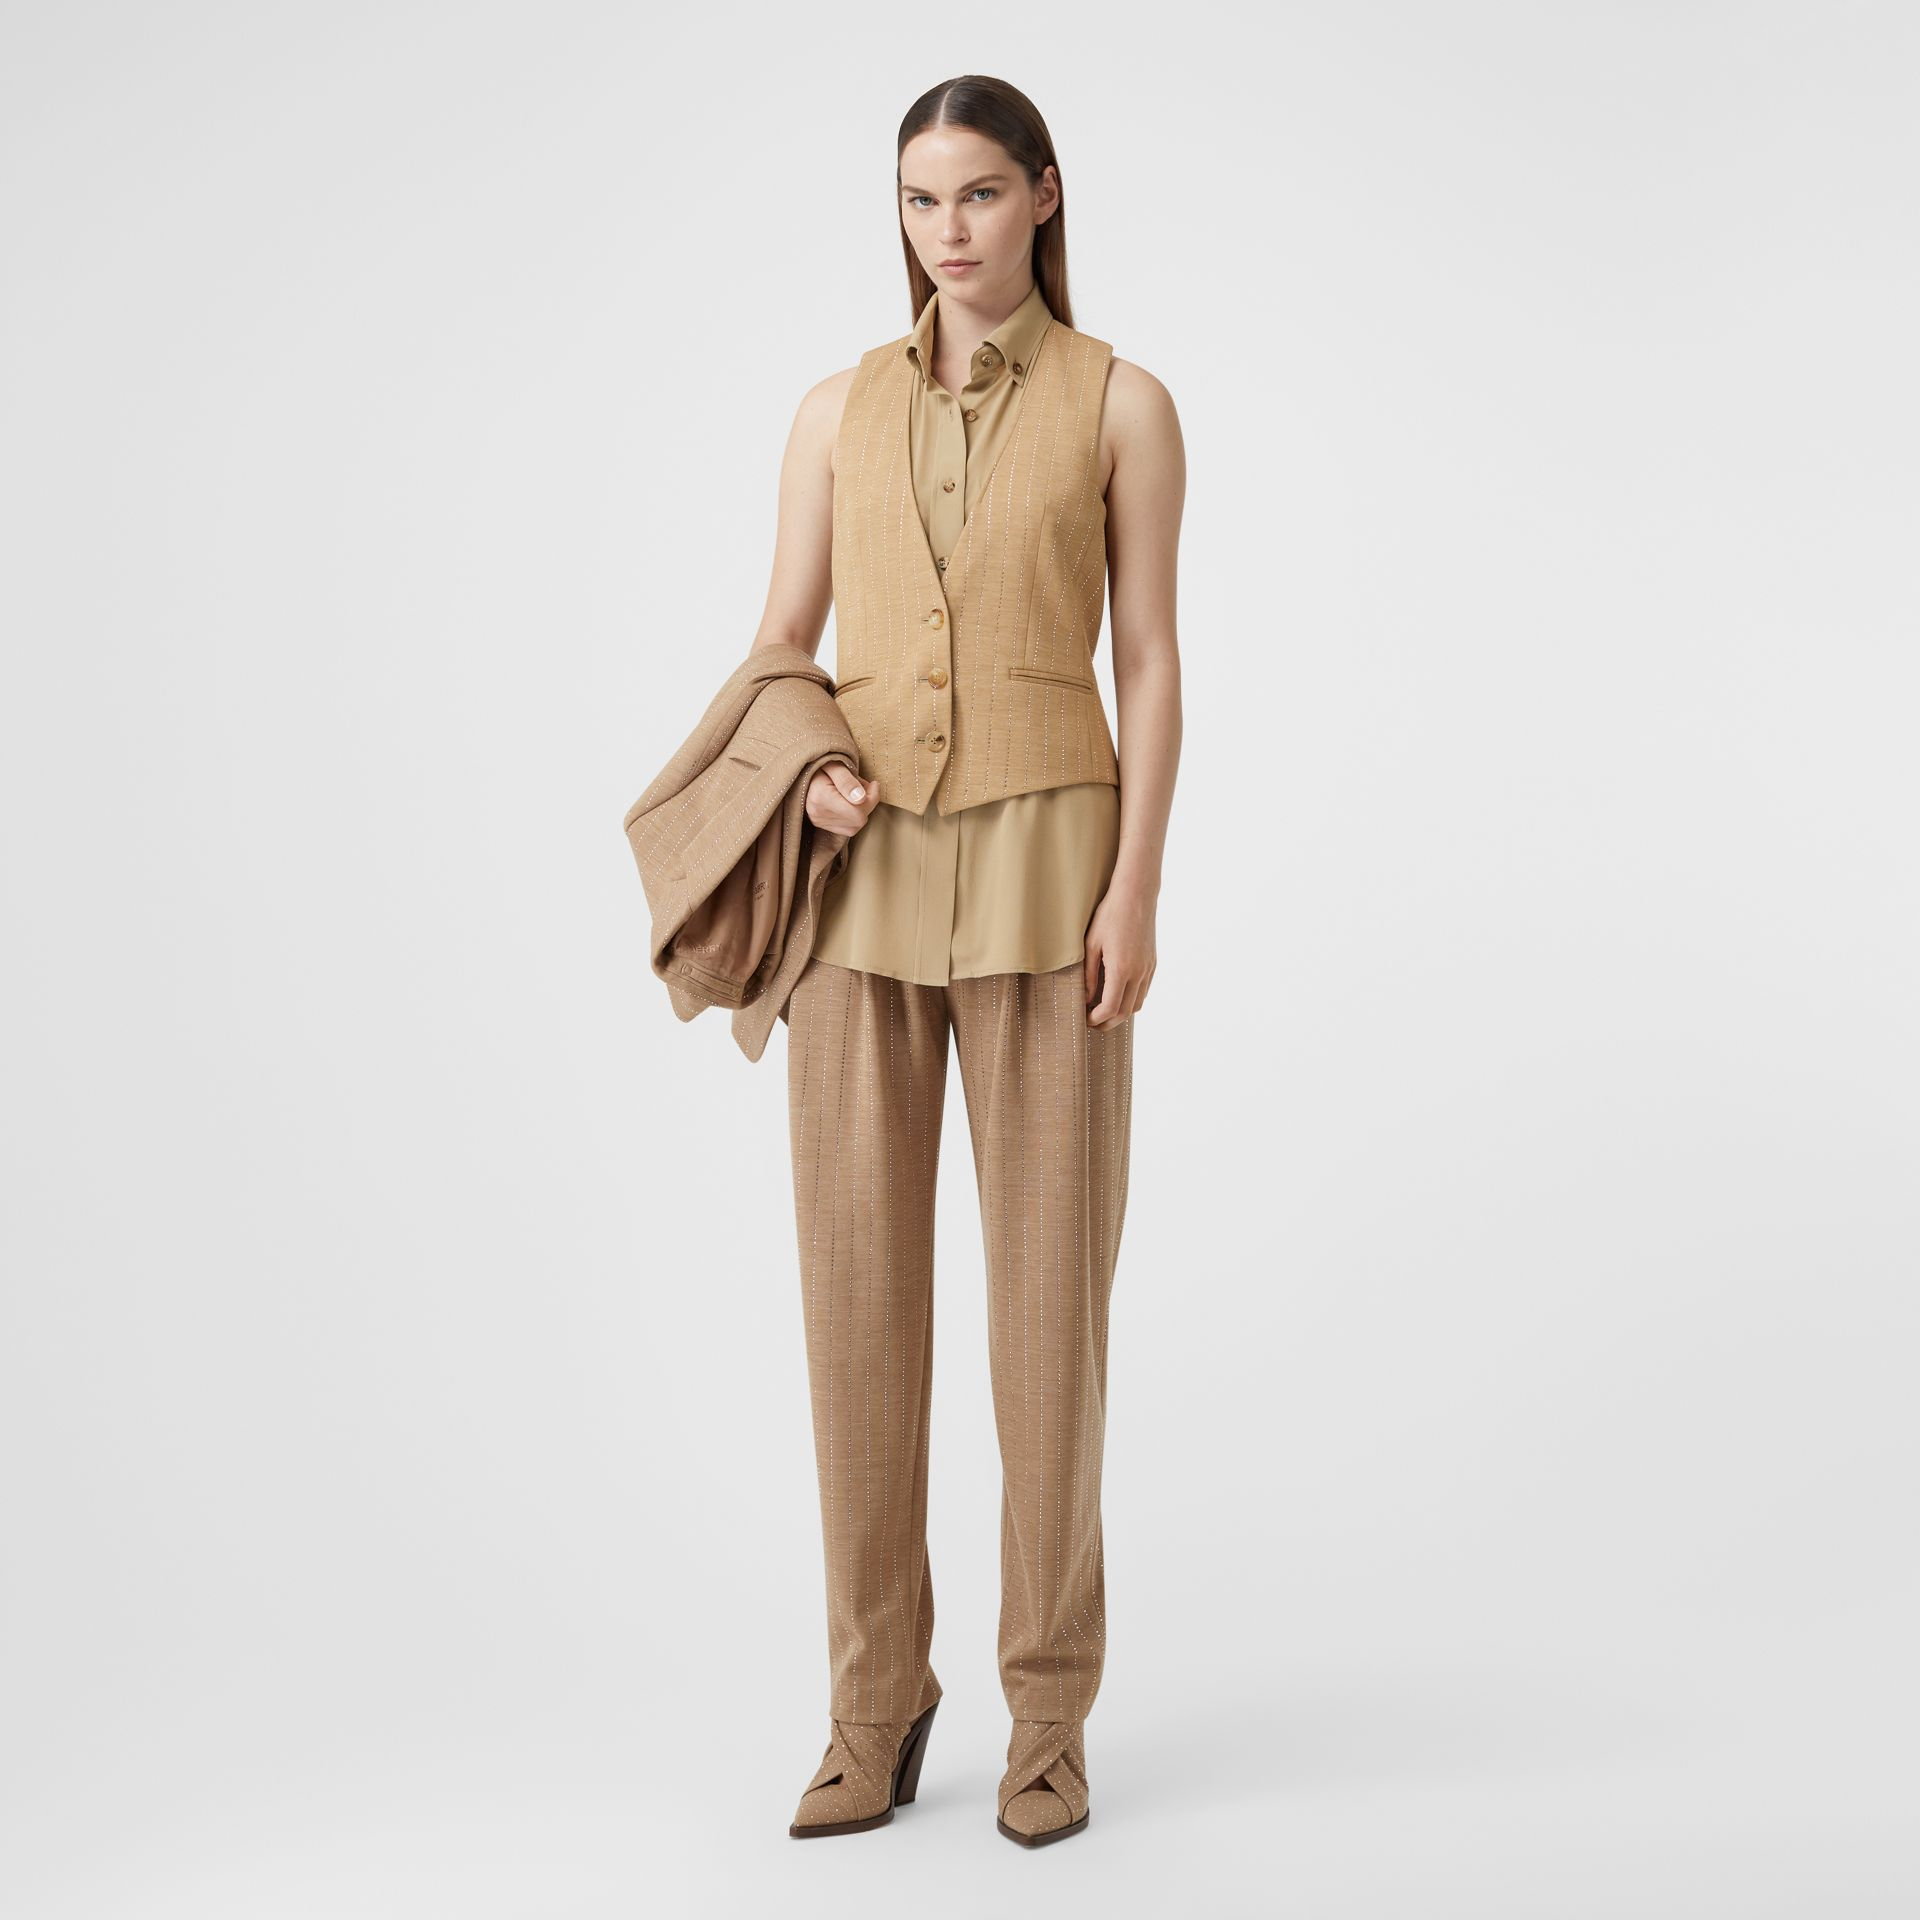 Shirt Detail Crystal Pinstriped Wool Blend Waistcoat in Pecan Melange - Women | Burberry Australia - gallery image 0